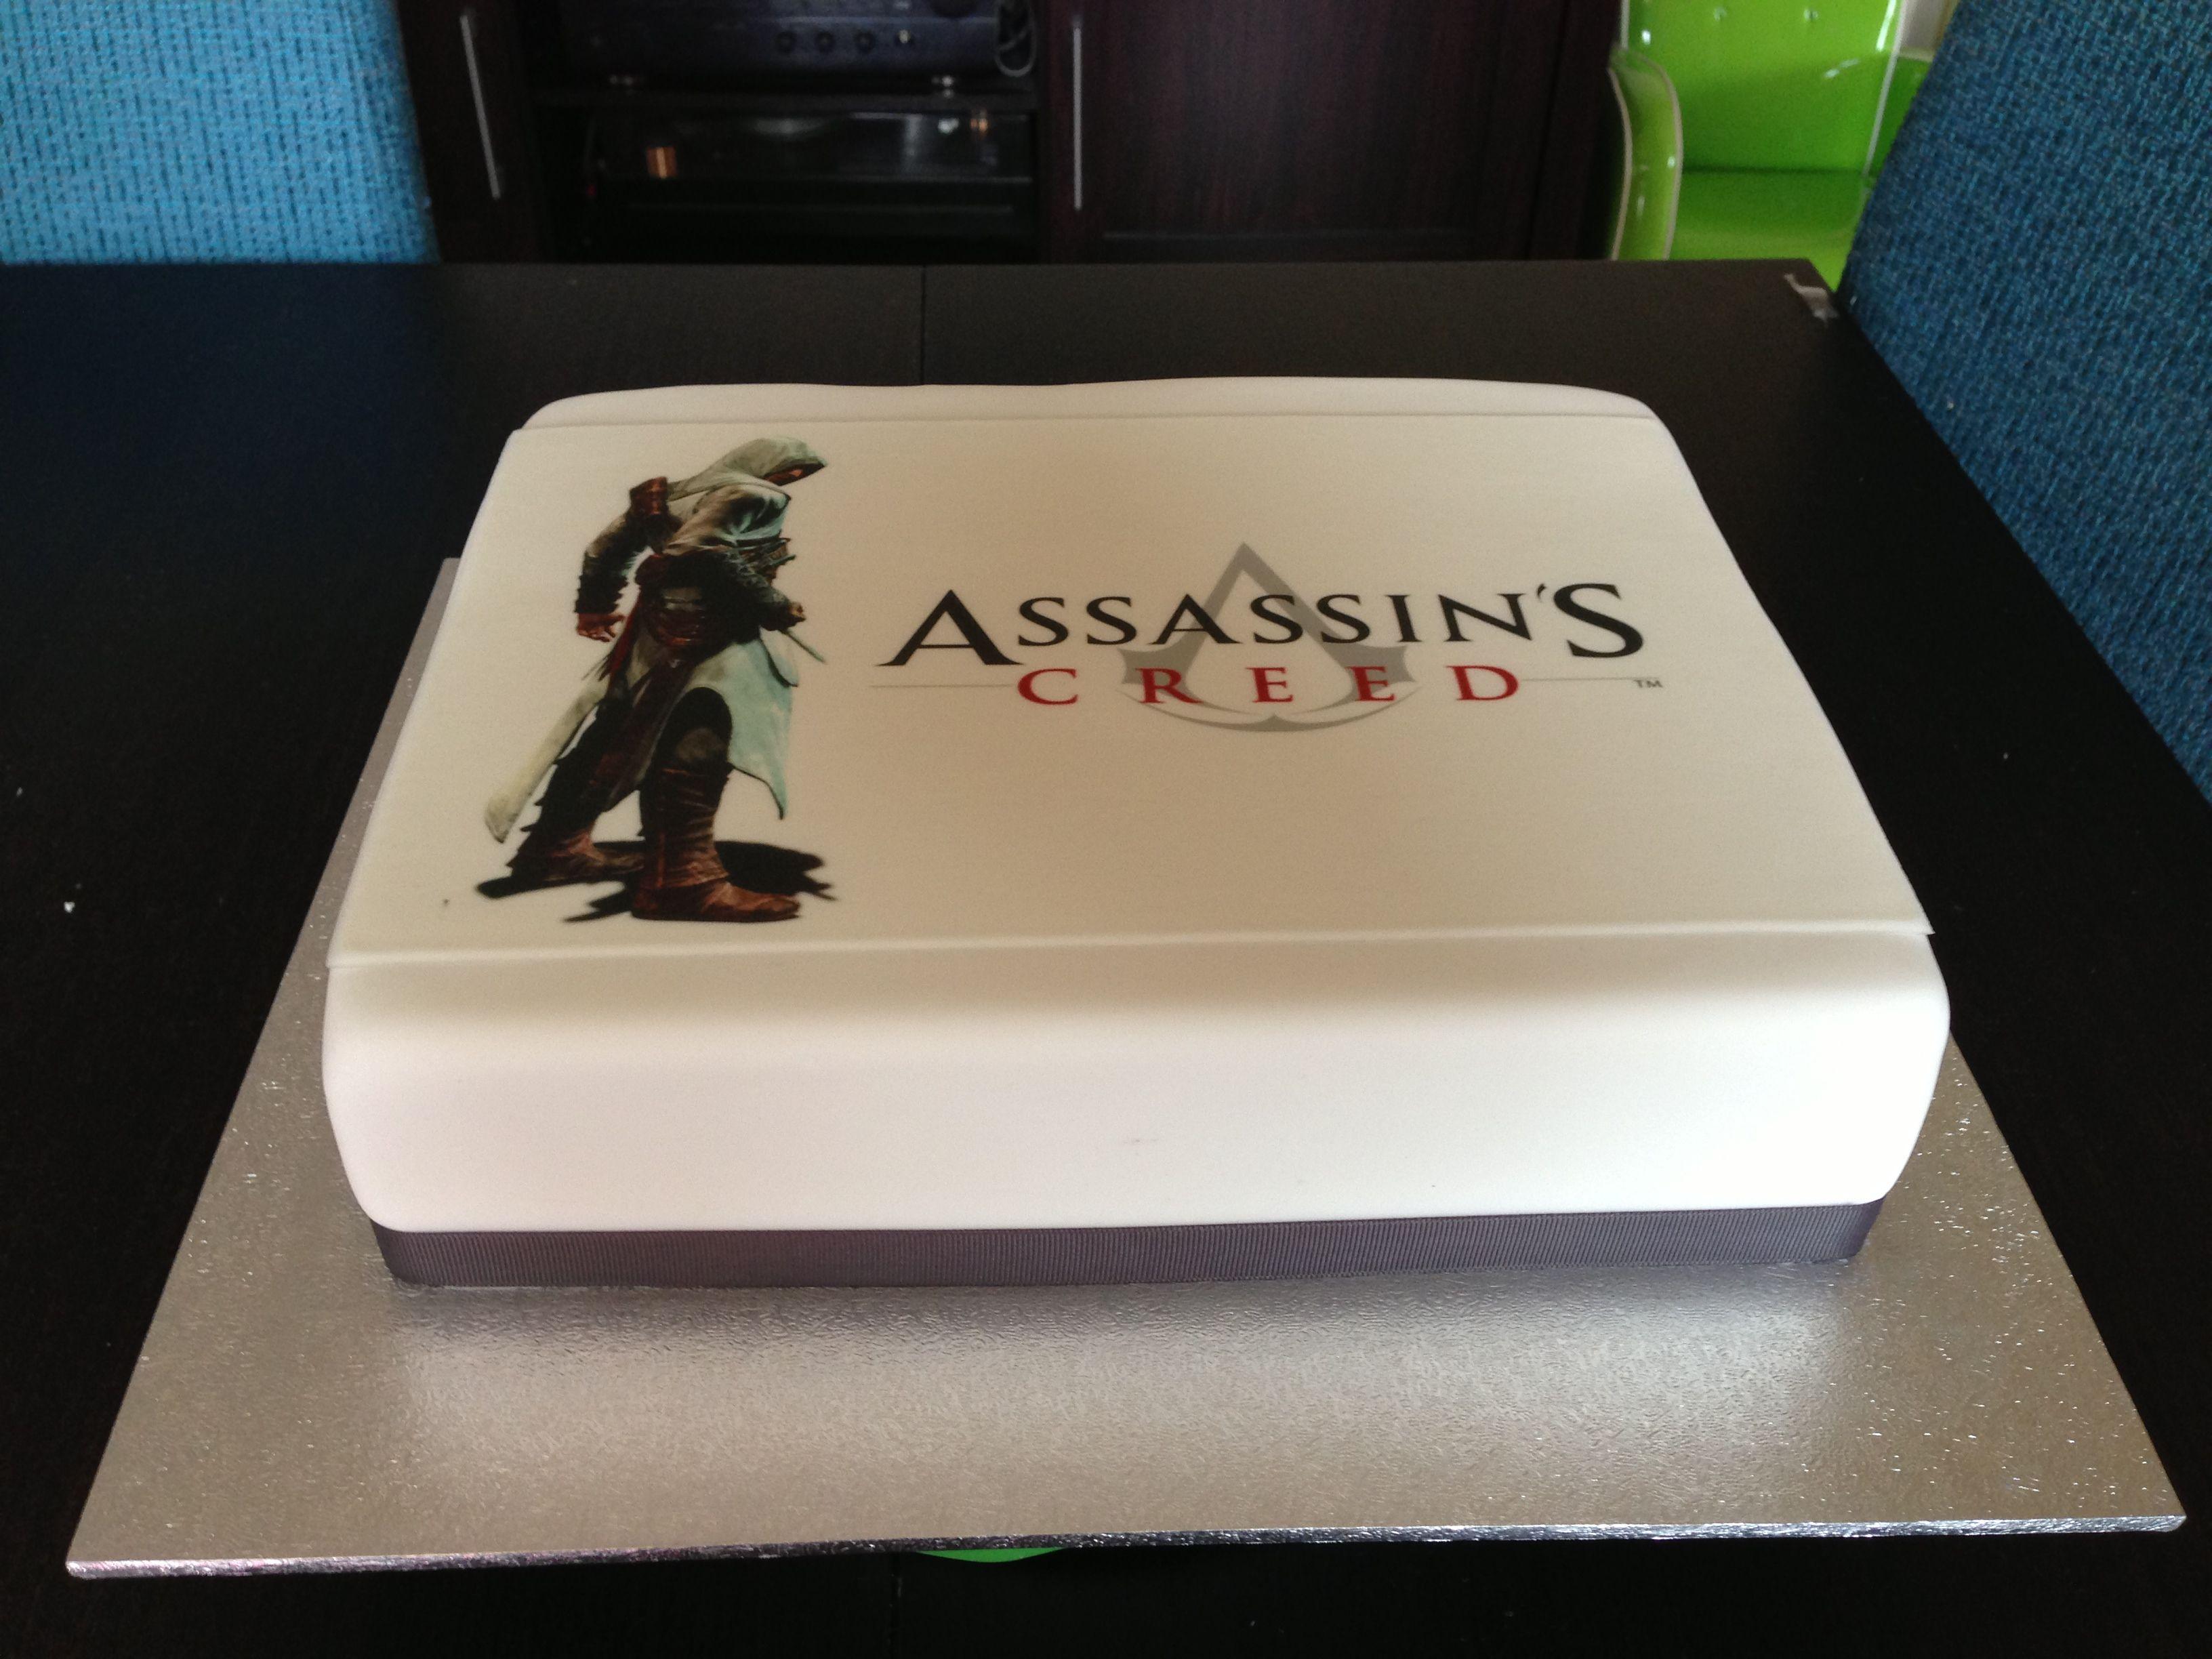 Cake Design Assassin S Creed : Assassins Creed Cake My birthday/present ideas Pinterest